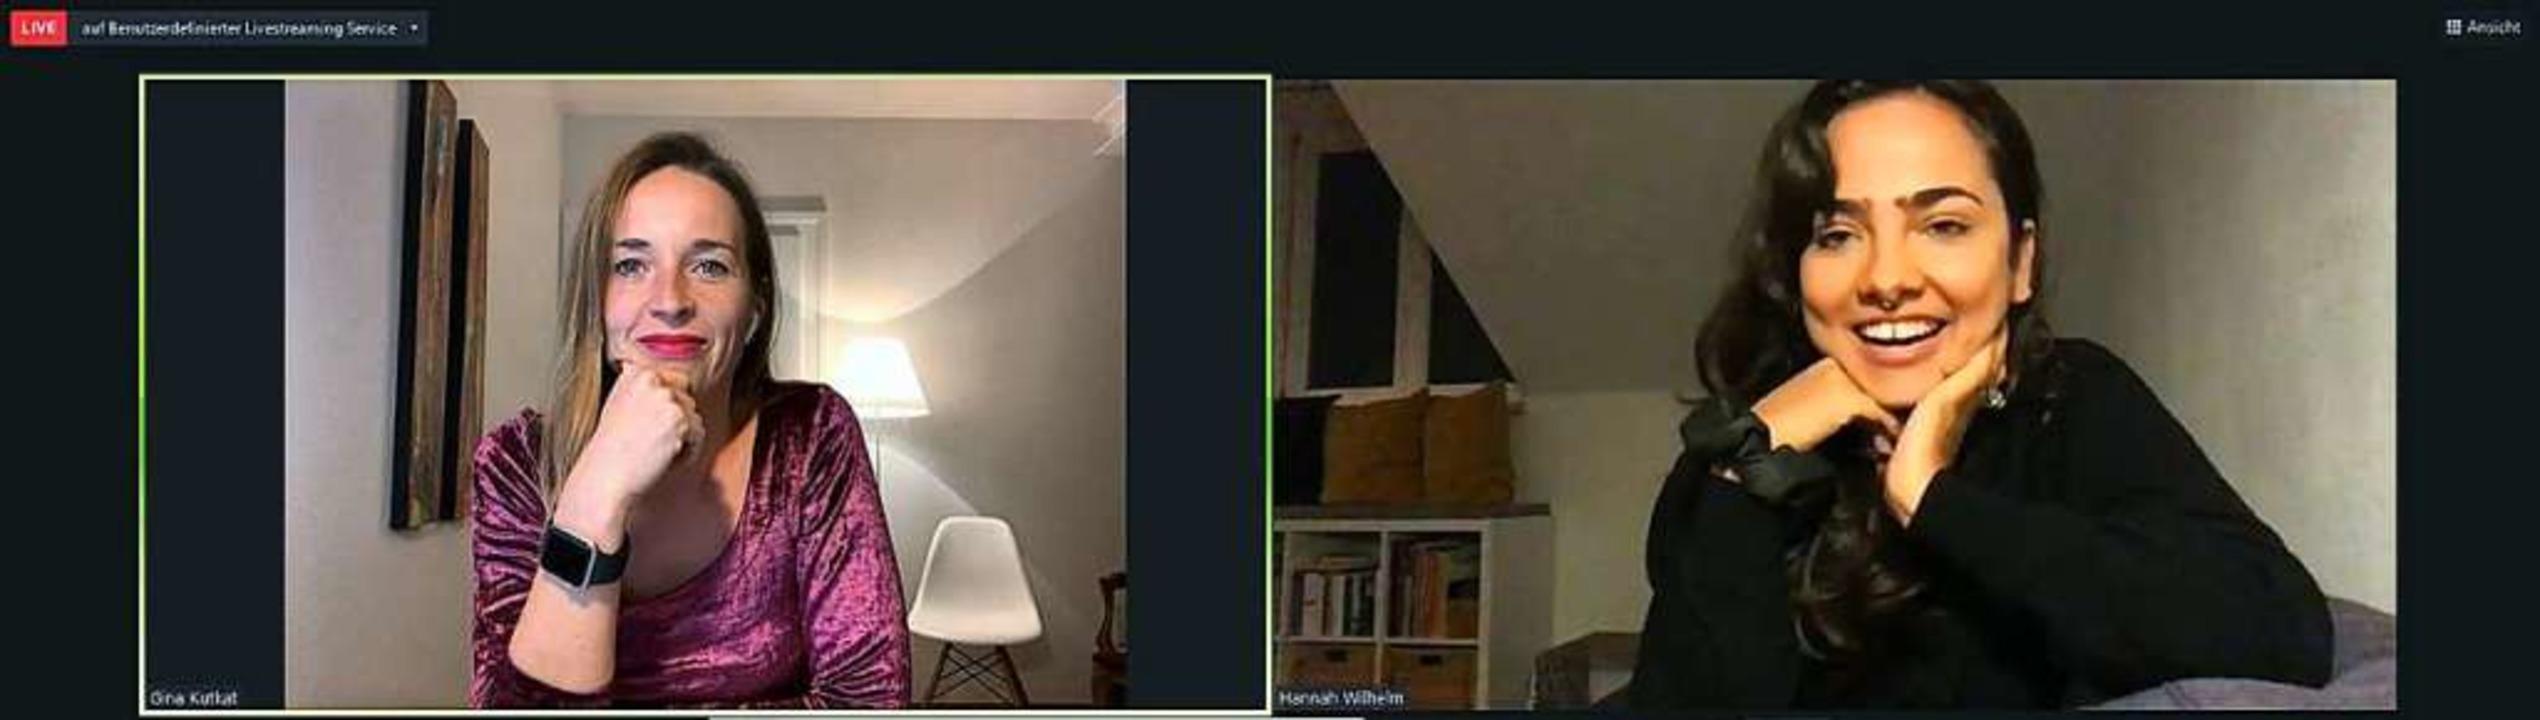 Gina Kutkat  | Foto: Screenshot